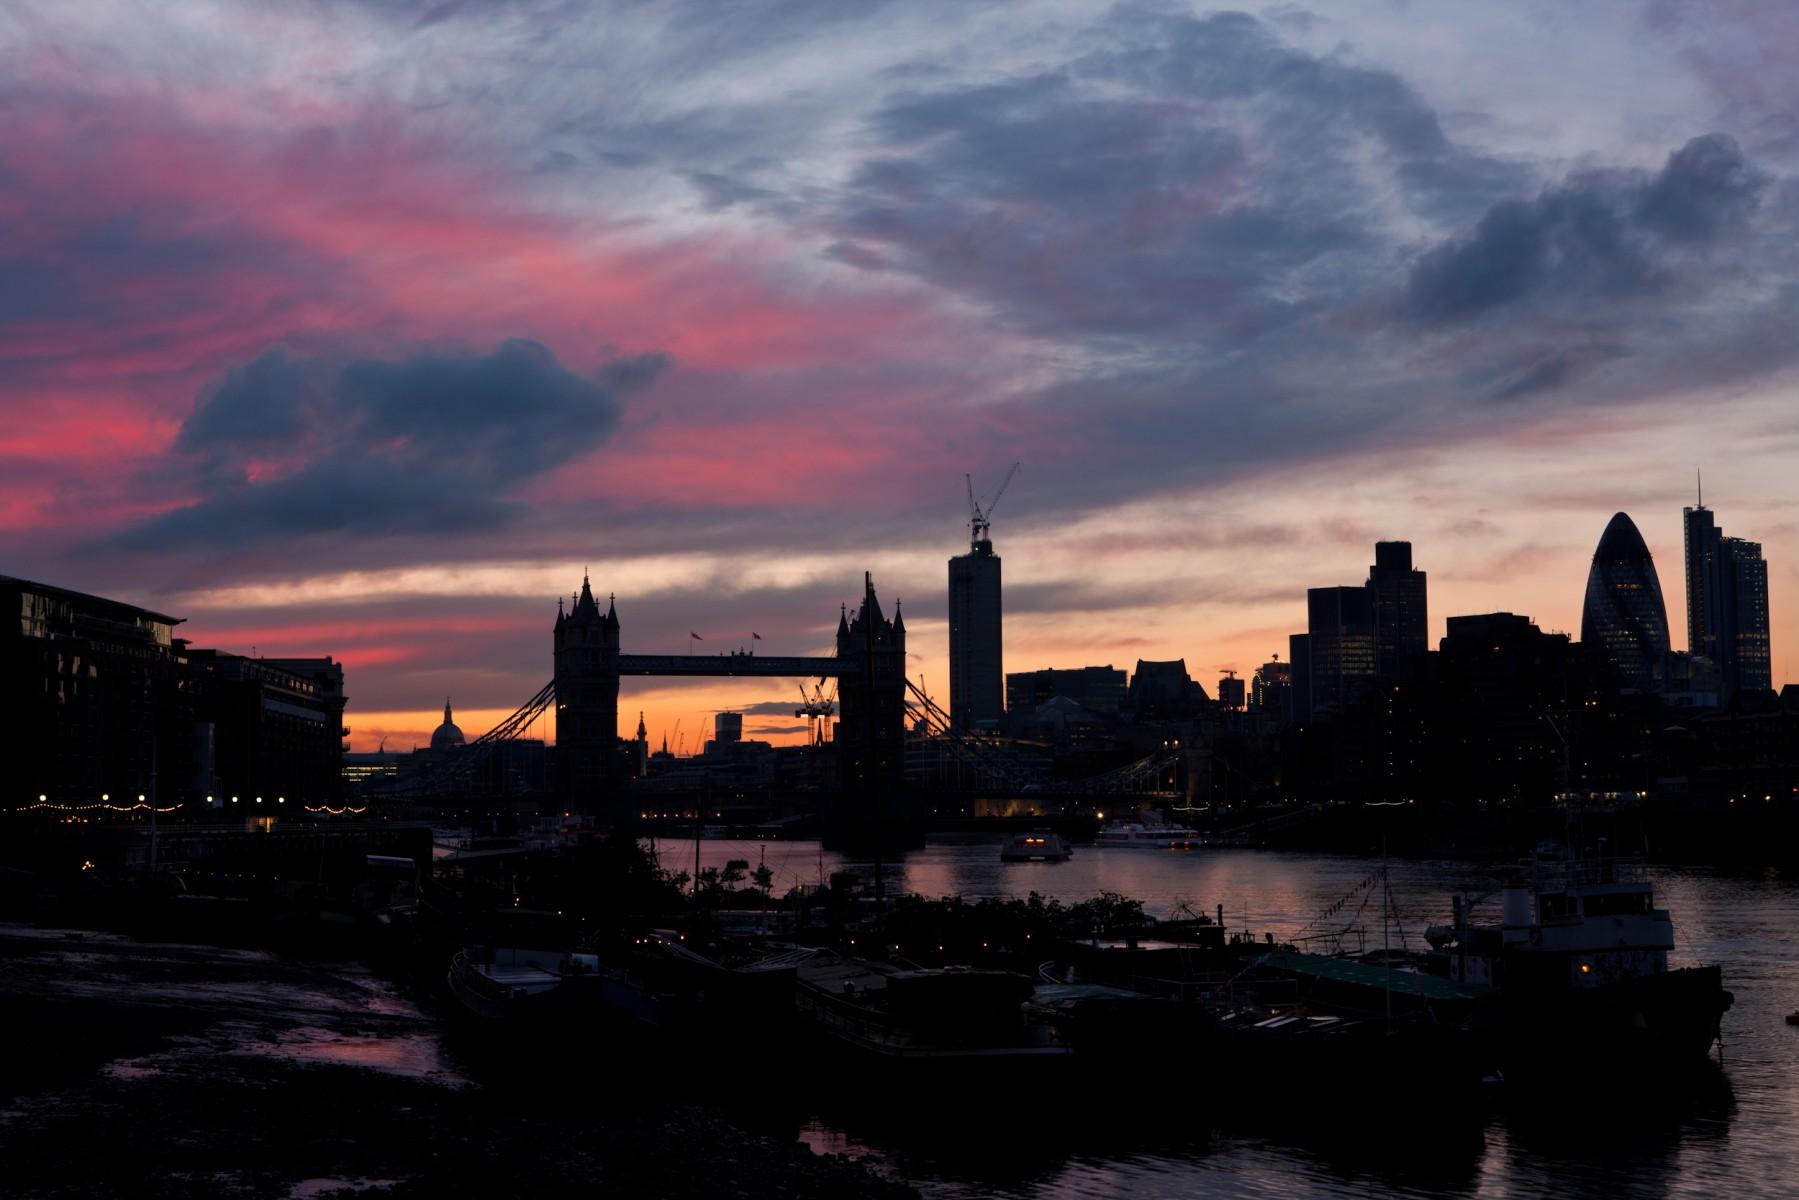 Evening sky over the City 1